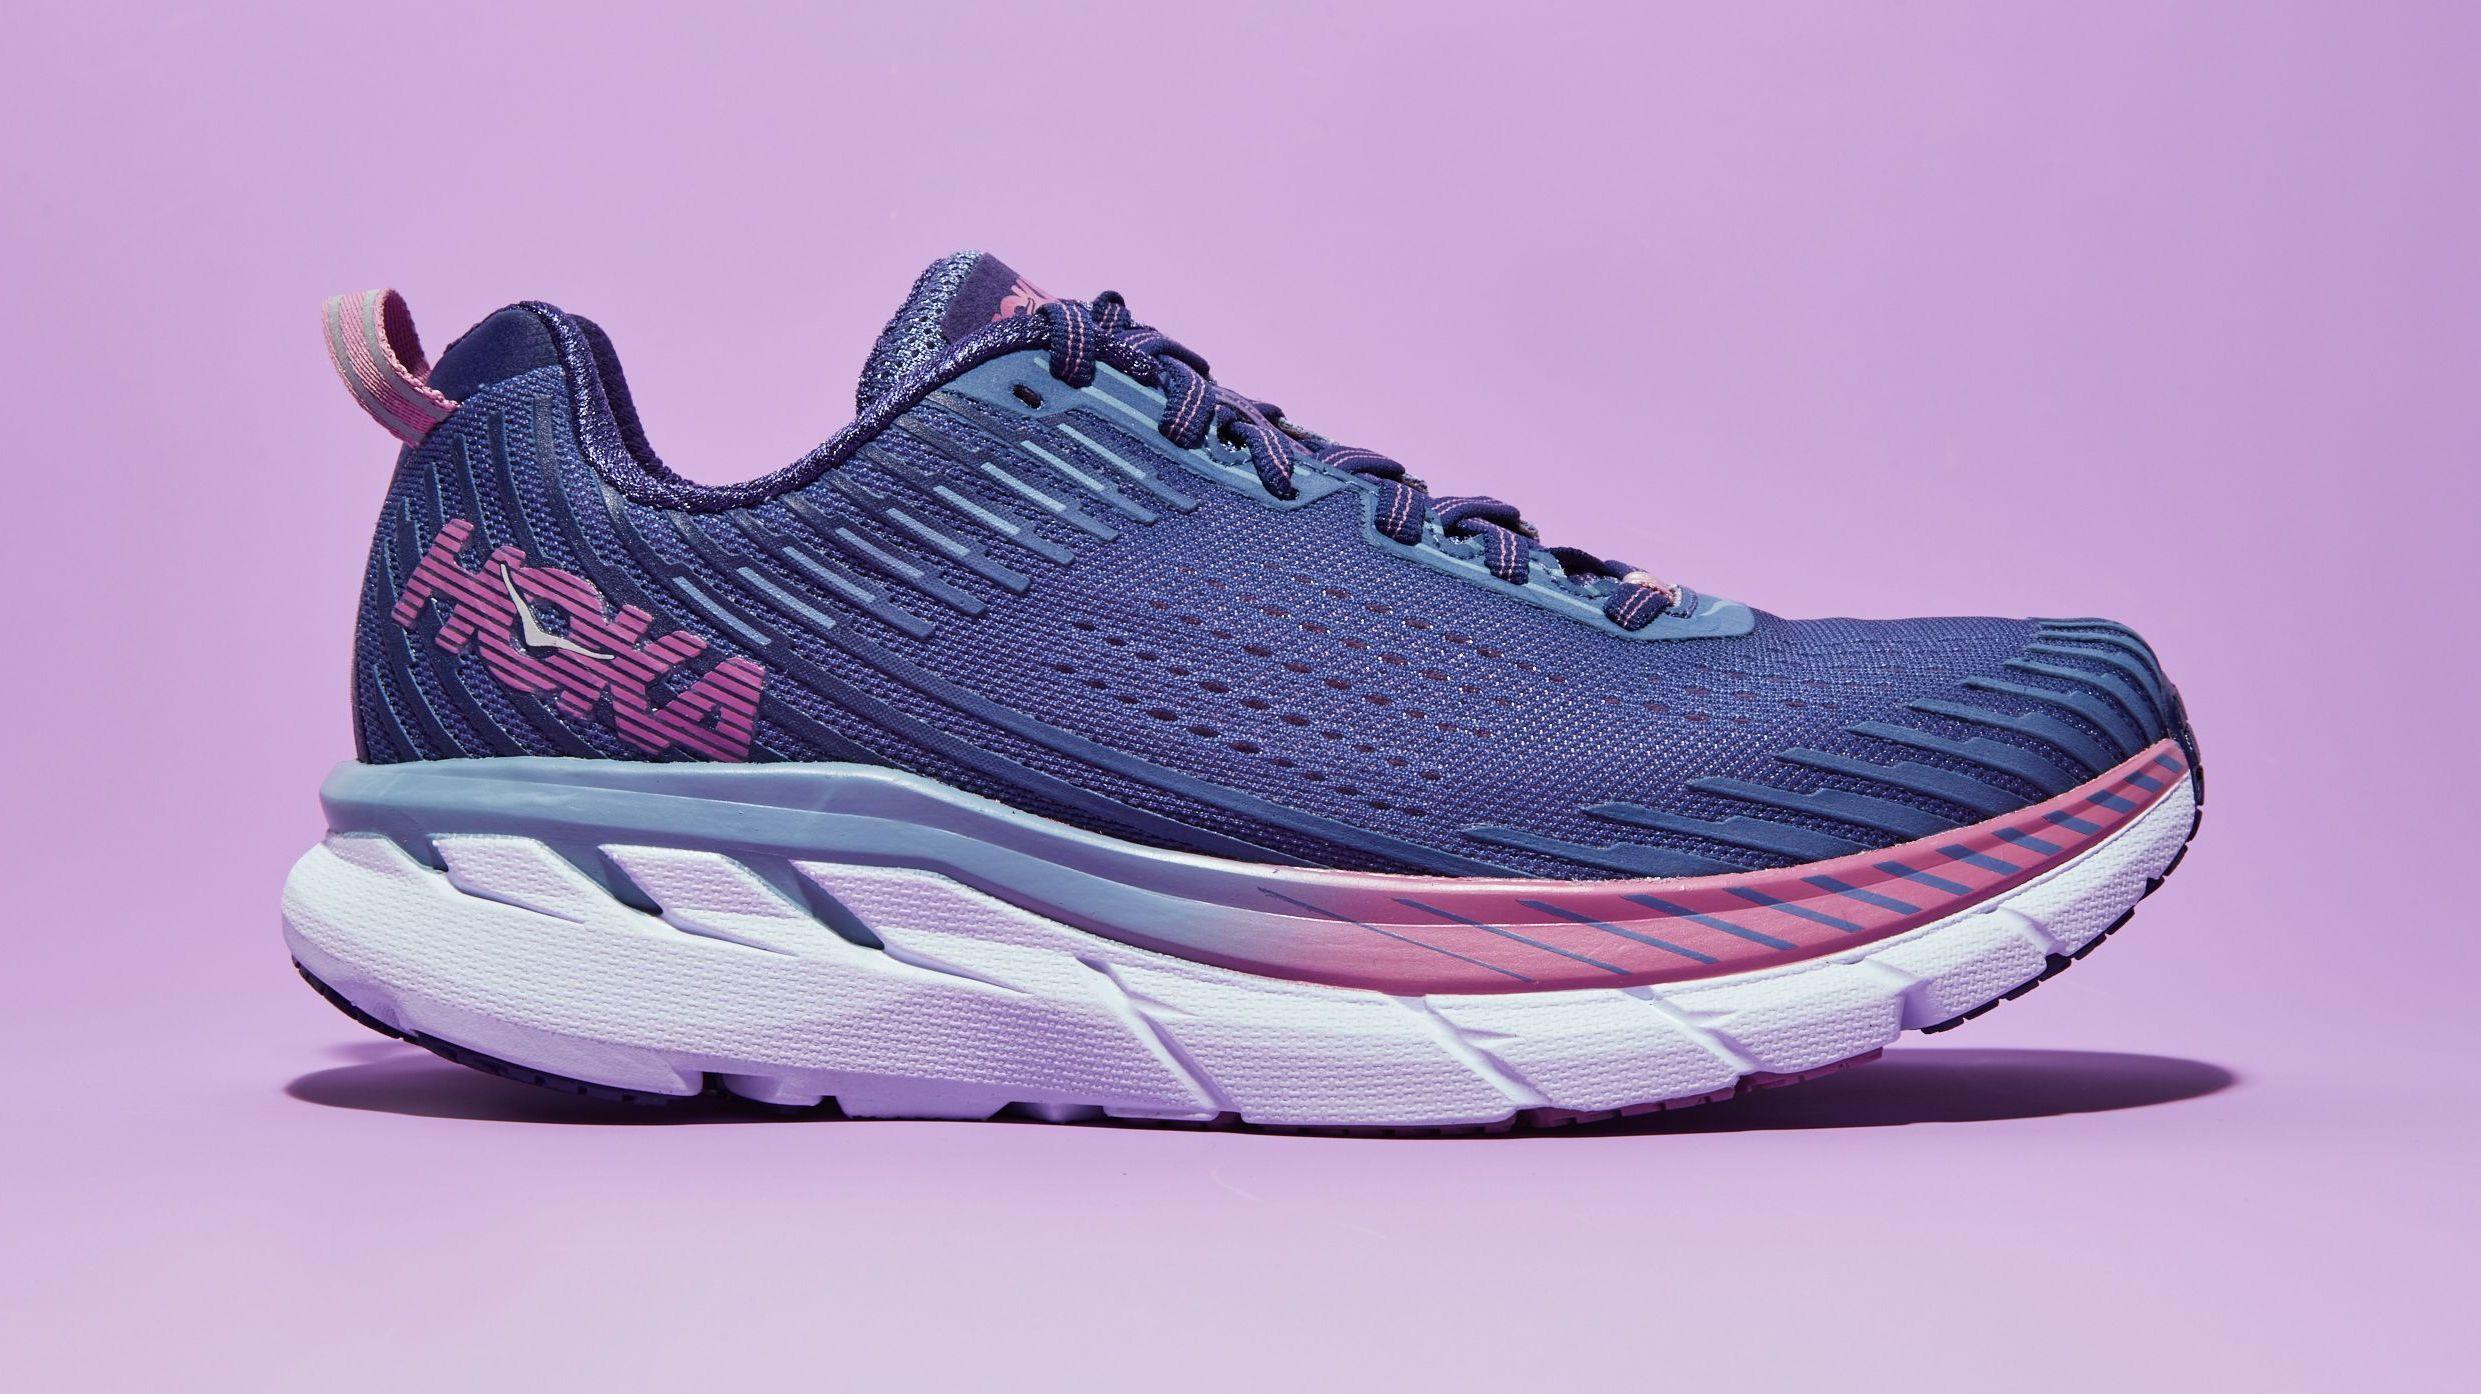 c1b1d4eac5238 Best Running Shoes for Women | Women's Running Shoes 2019